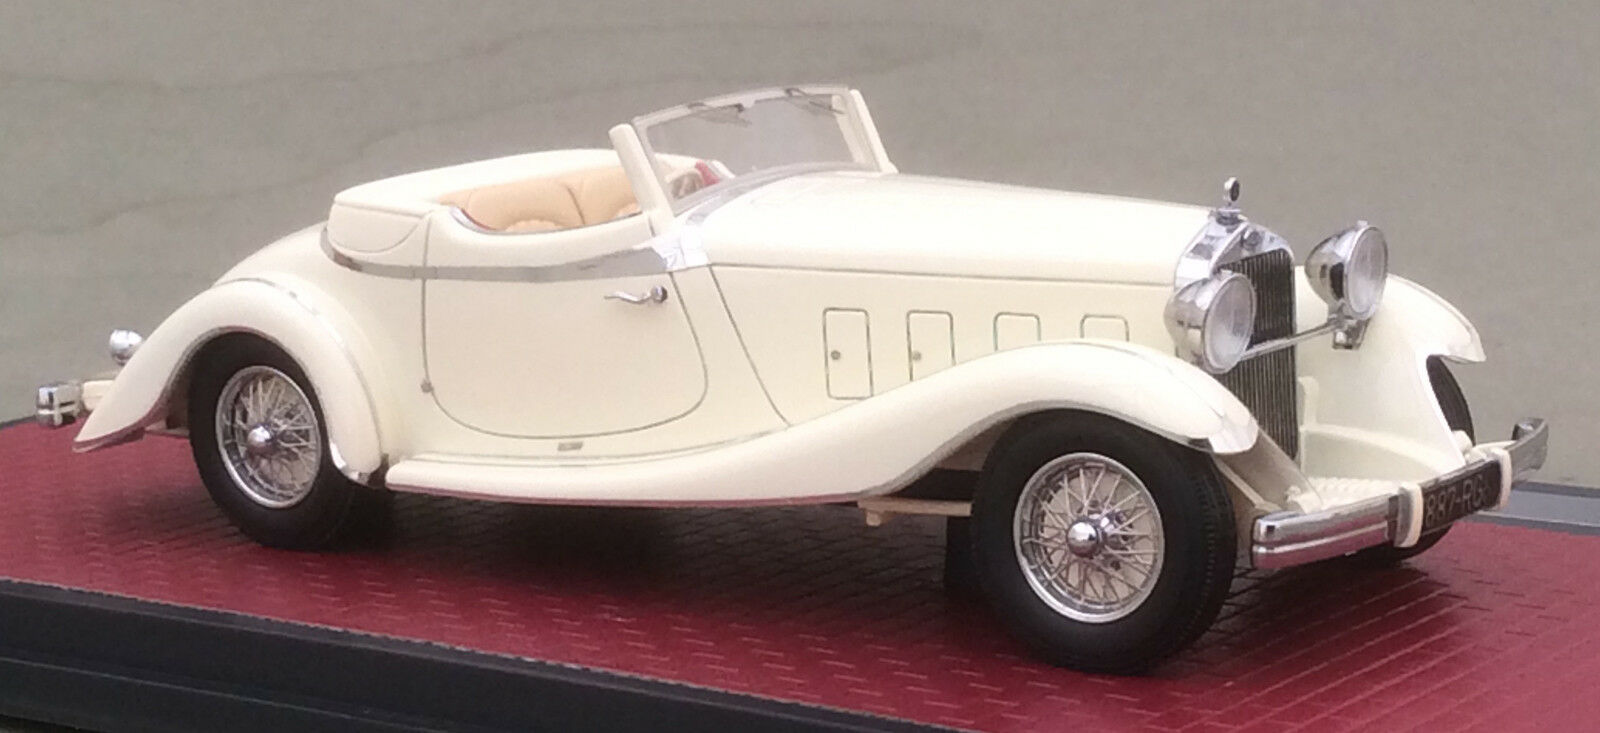 MX50407-031 1933 Delage D8S de  Villars Roadster  pas de taxes